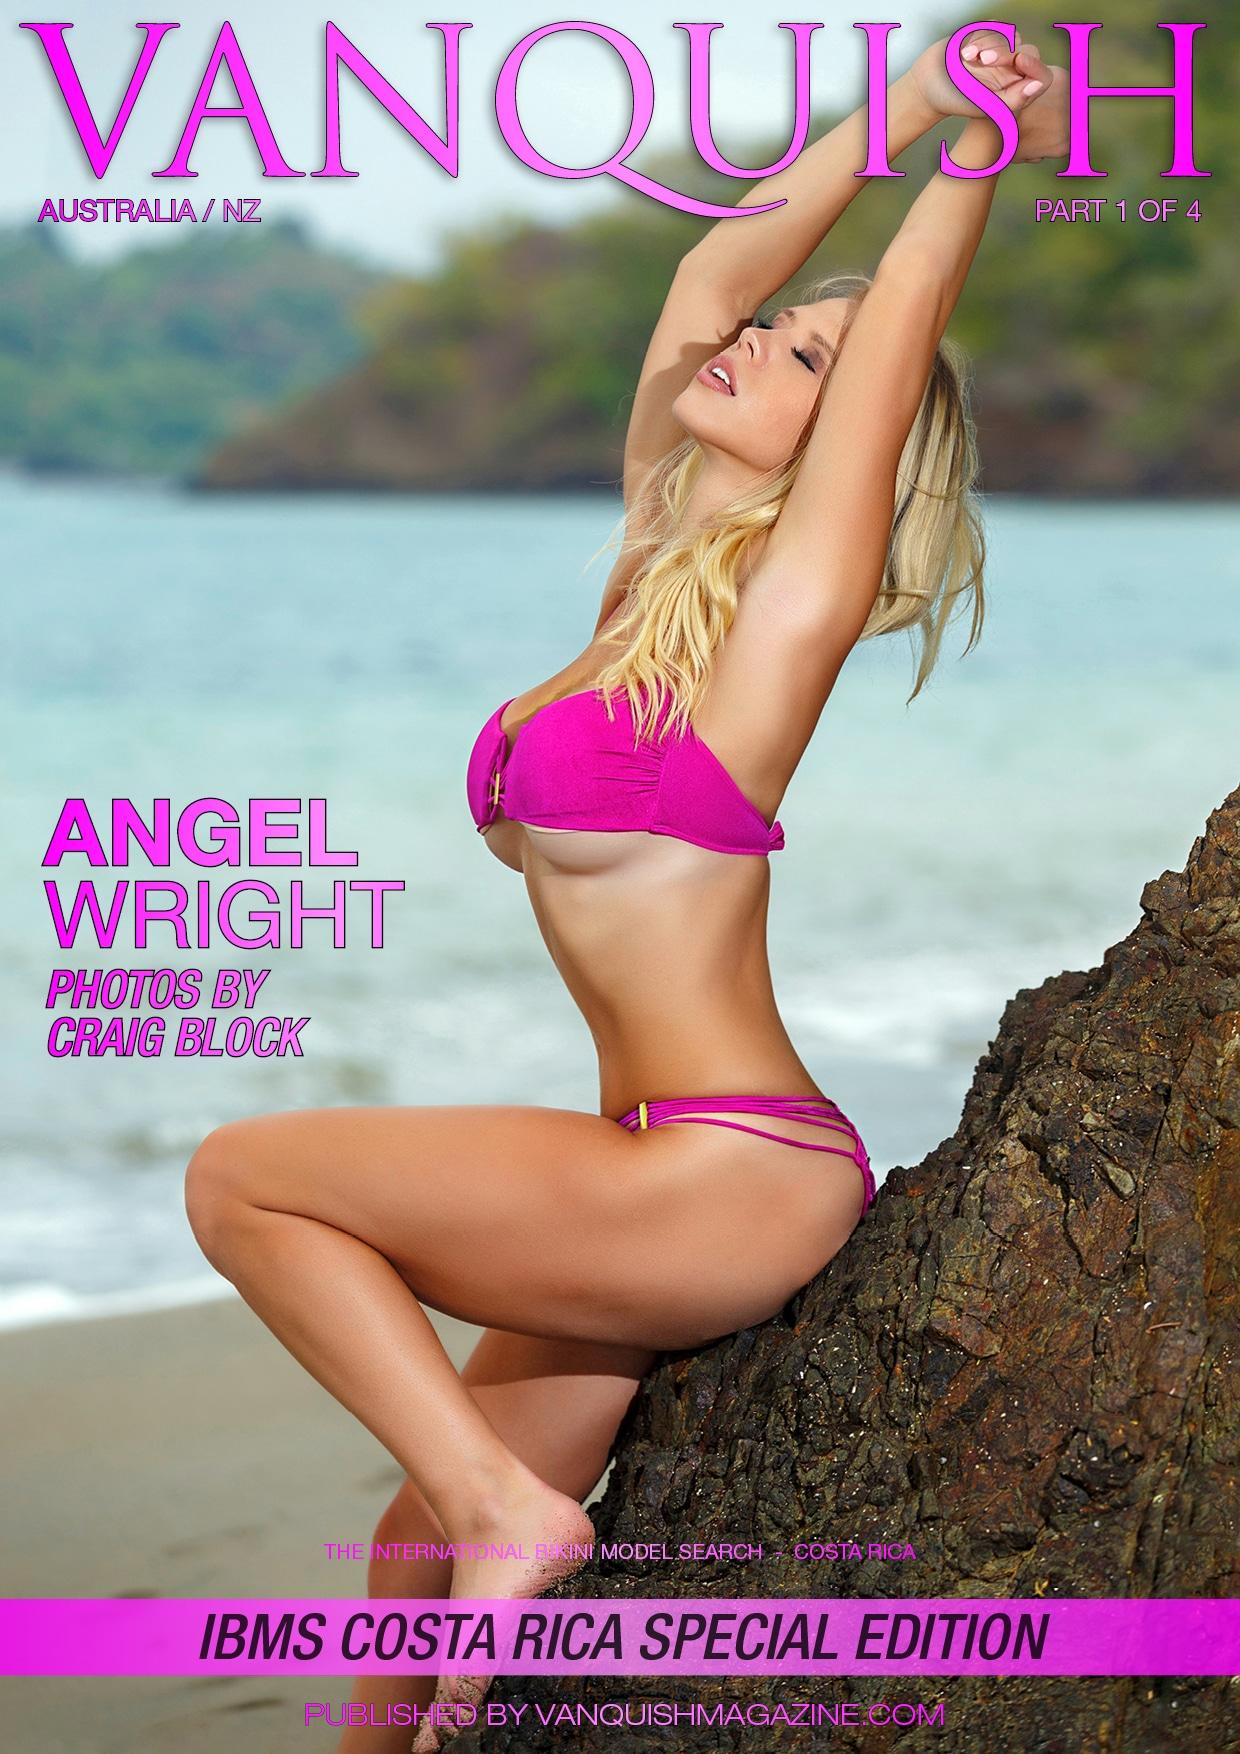 Vanquish Magazine - IBMS Costa Rica - Part 1 - Angel Wright 1